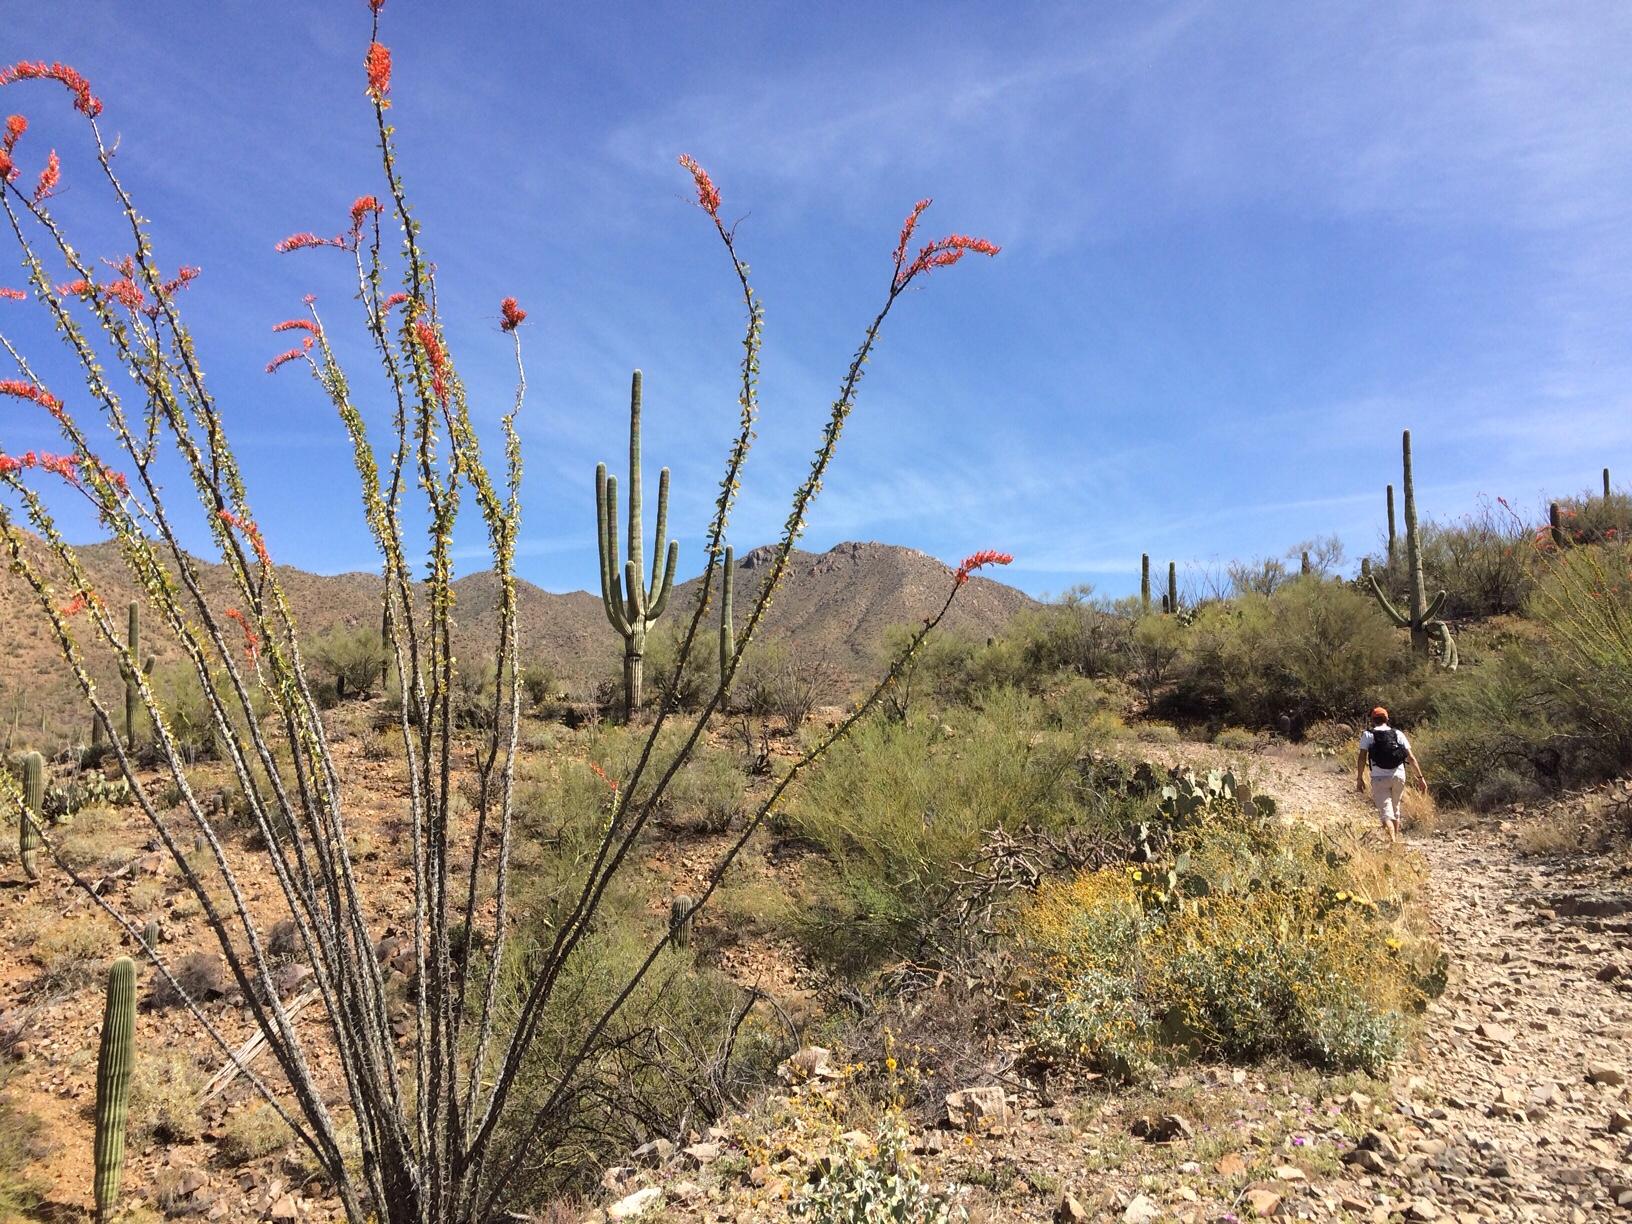 English hubby hiking ahead in the desert